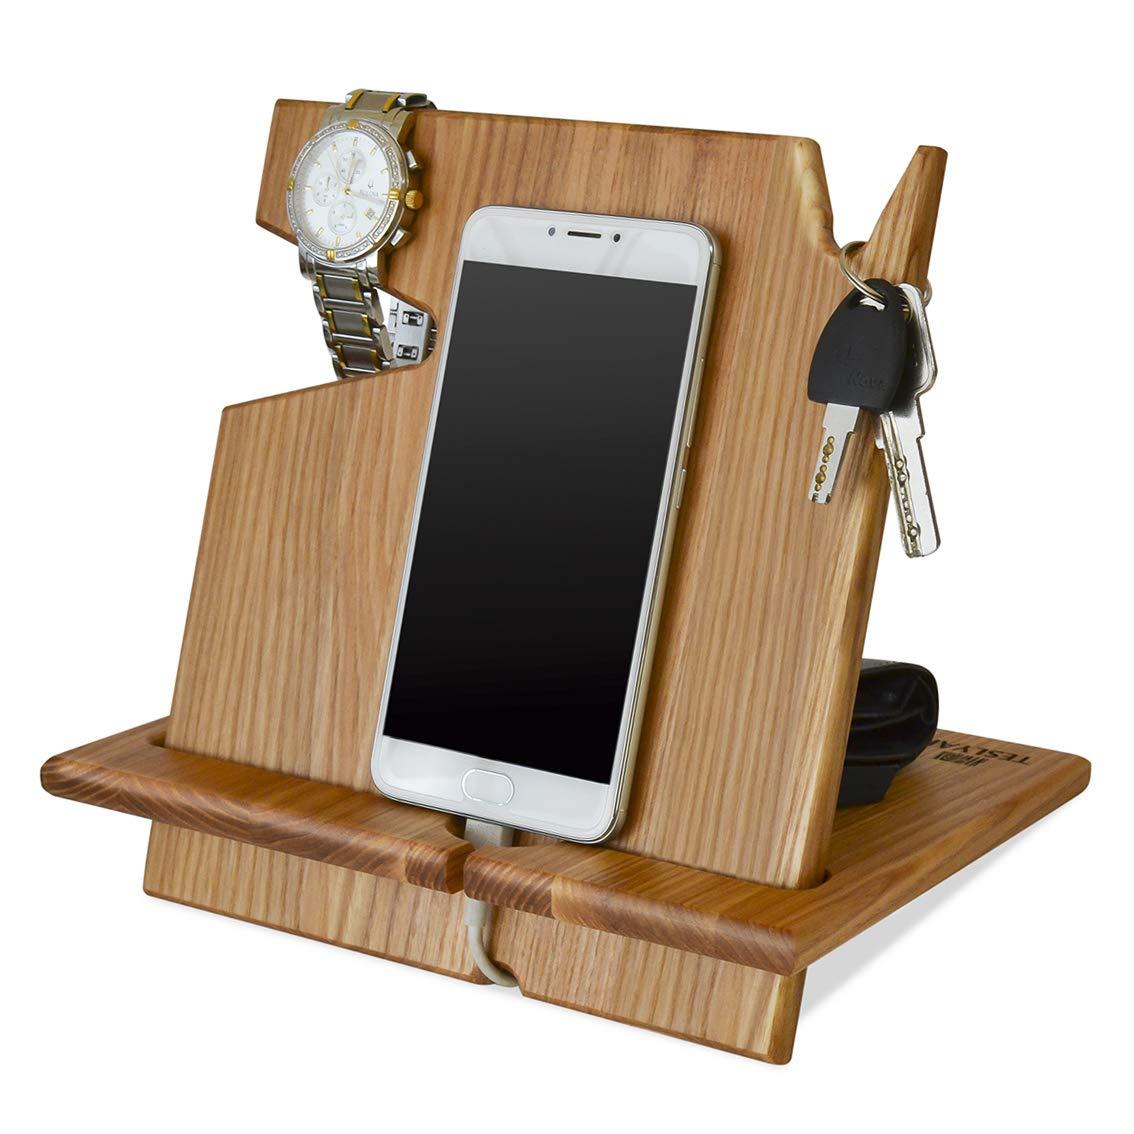 2abc81a8f682 Wood Phone Docking Station Ash Key Holder Wallet Stand Watch Organizer Men  Gift Husband Wife Anniversary Dad Birthday Nightstand Purse Tablet Boyfriend  ...